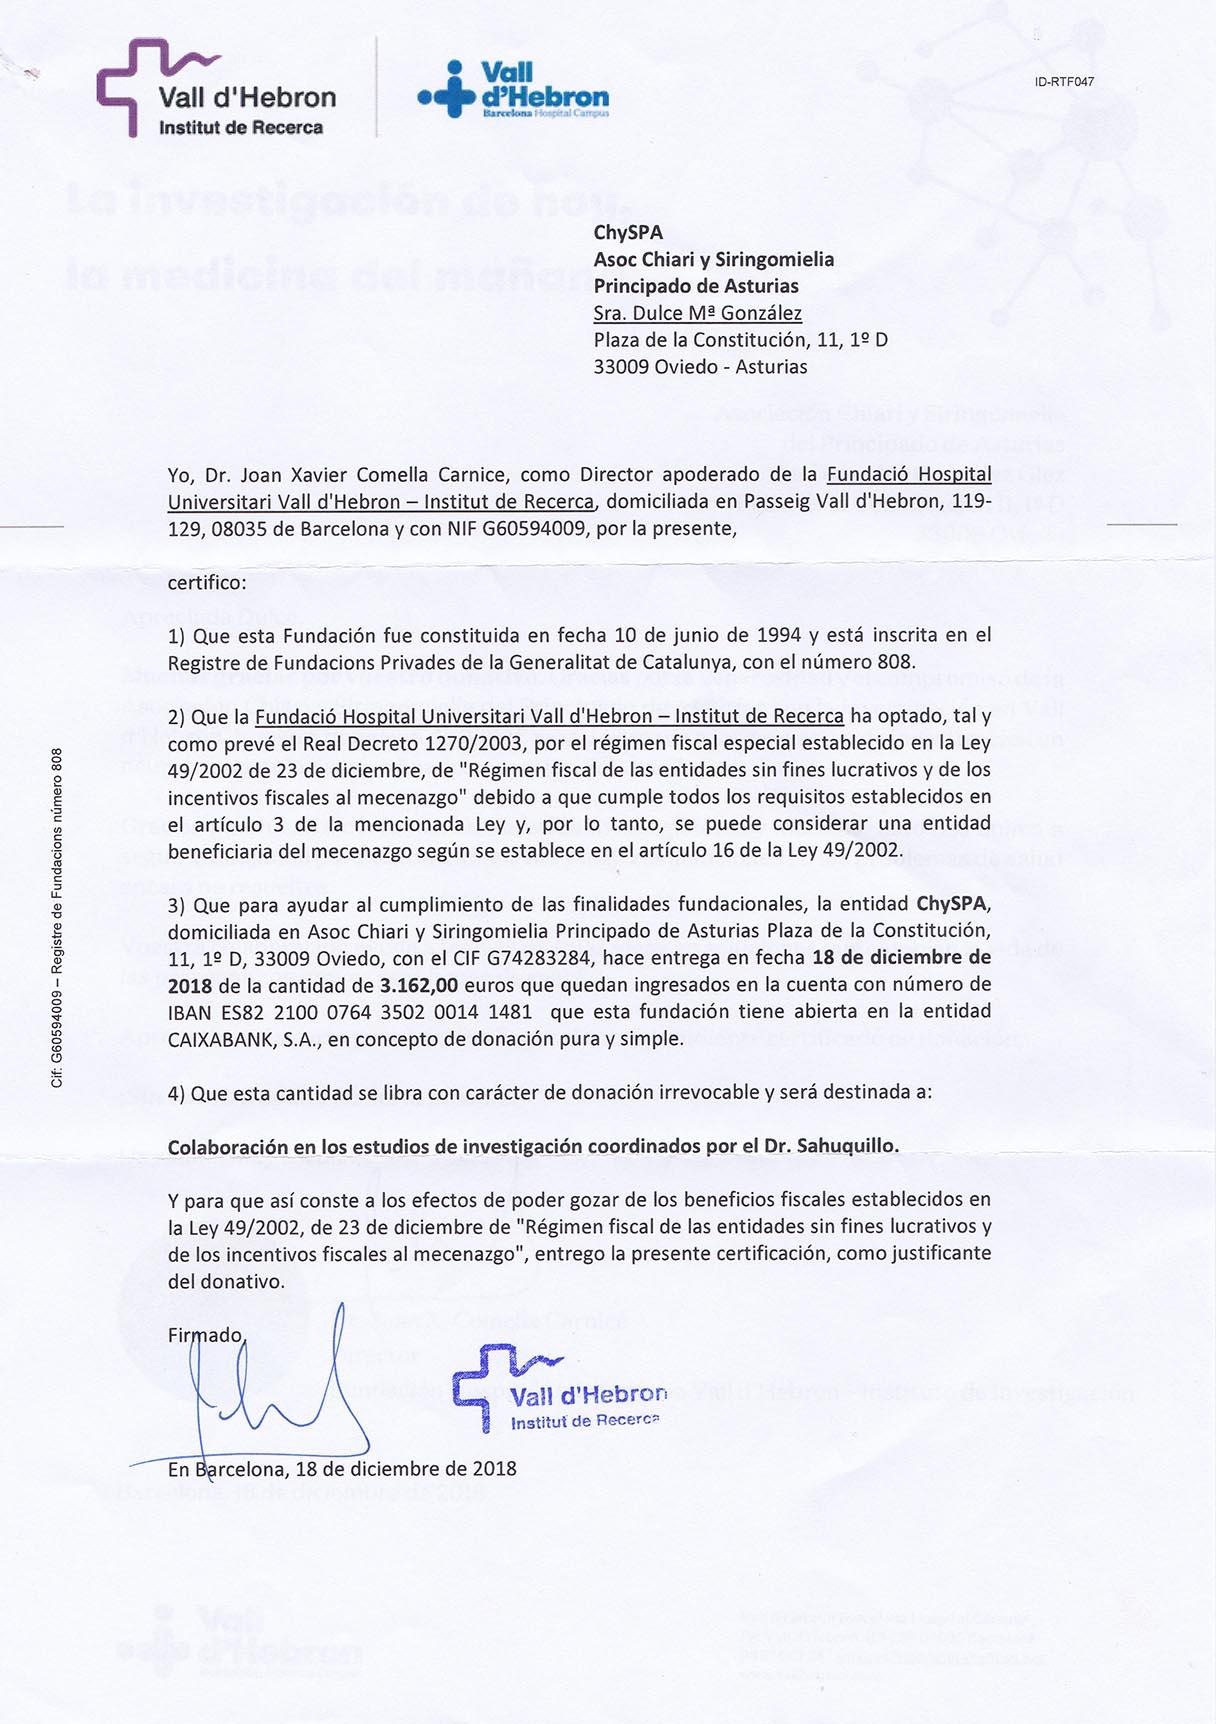 donacion Vall dHebron